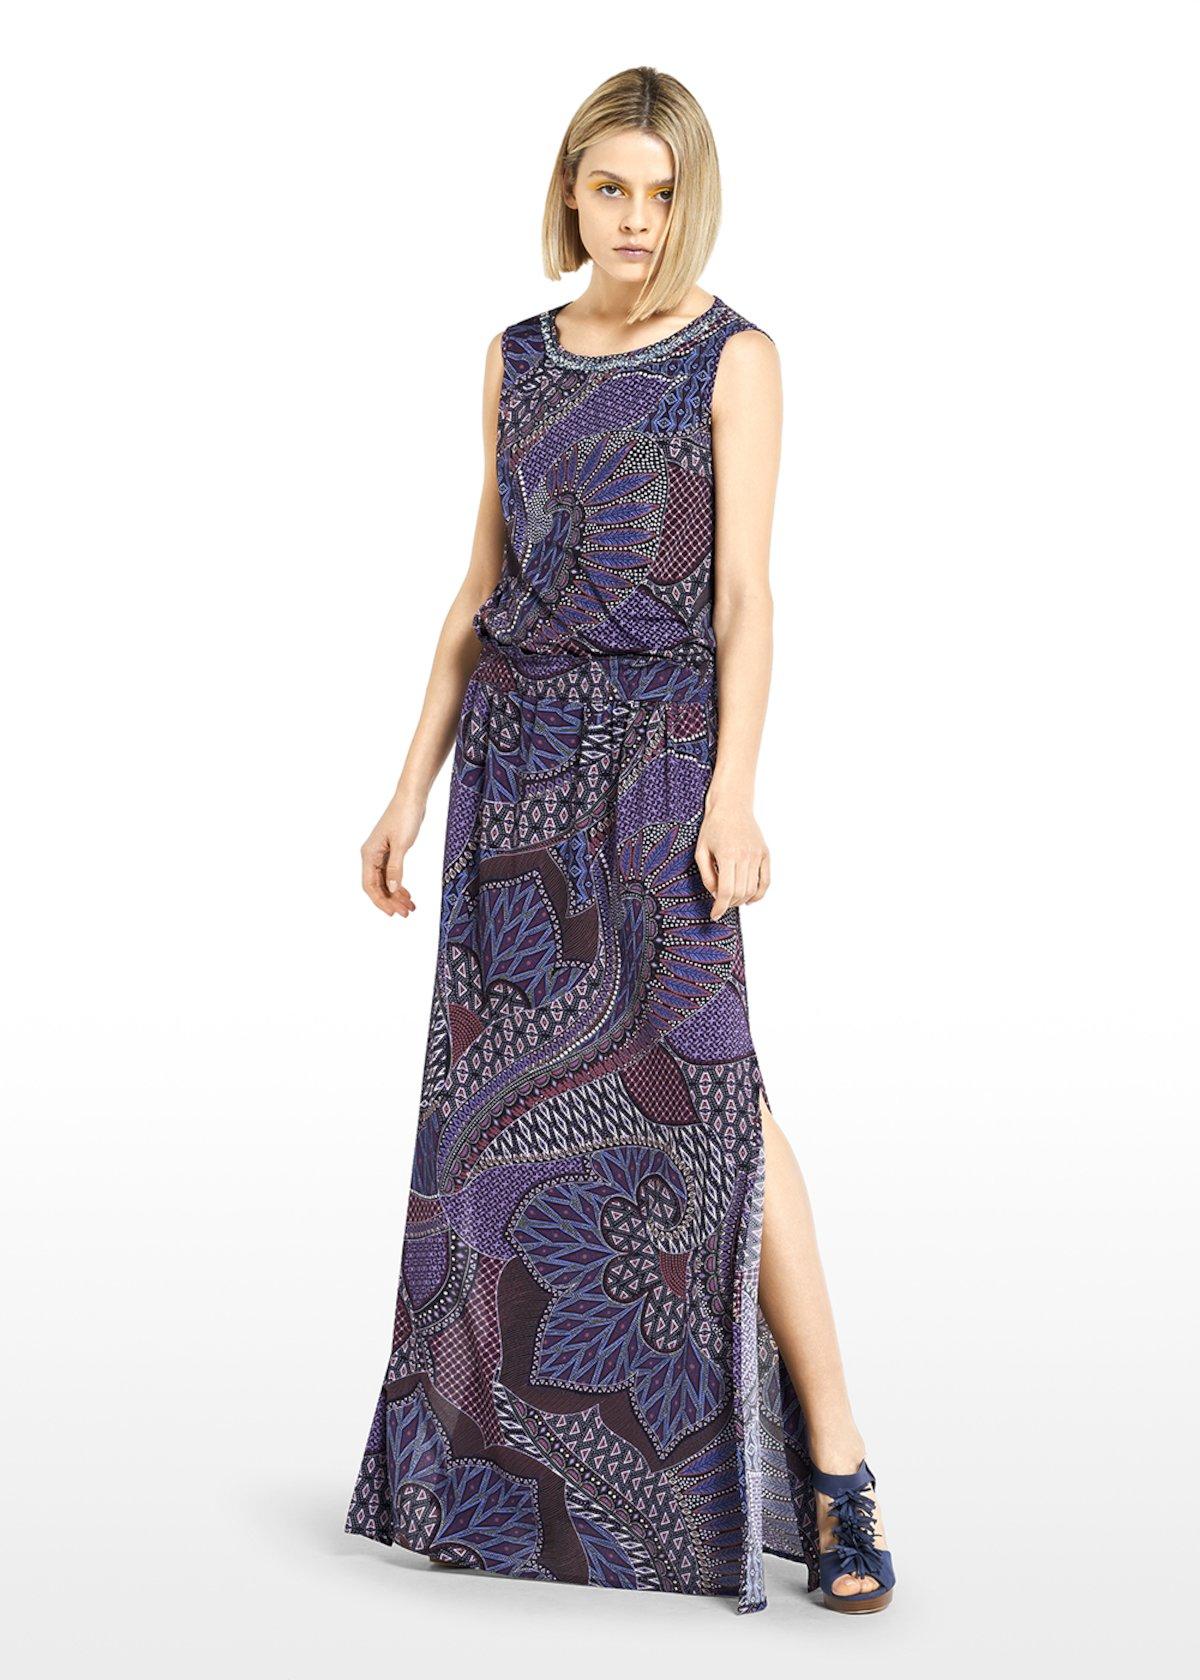 Glady long skirt henna pattern - Melanzana / Lapis Fantasia - Woman - Category image